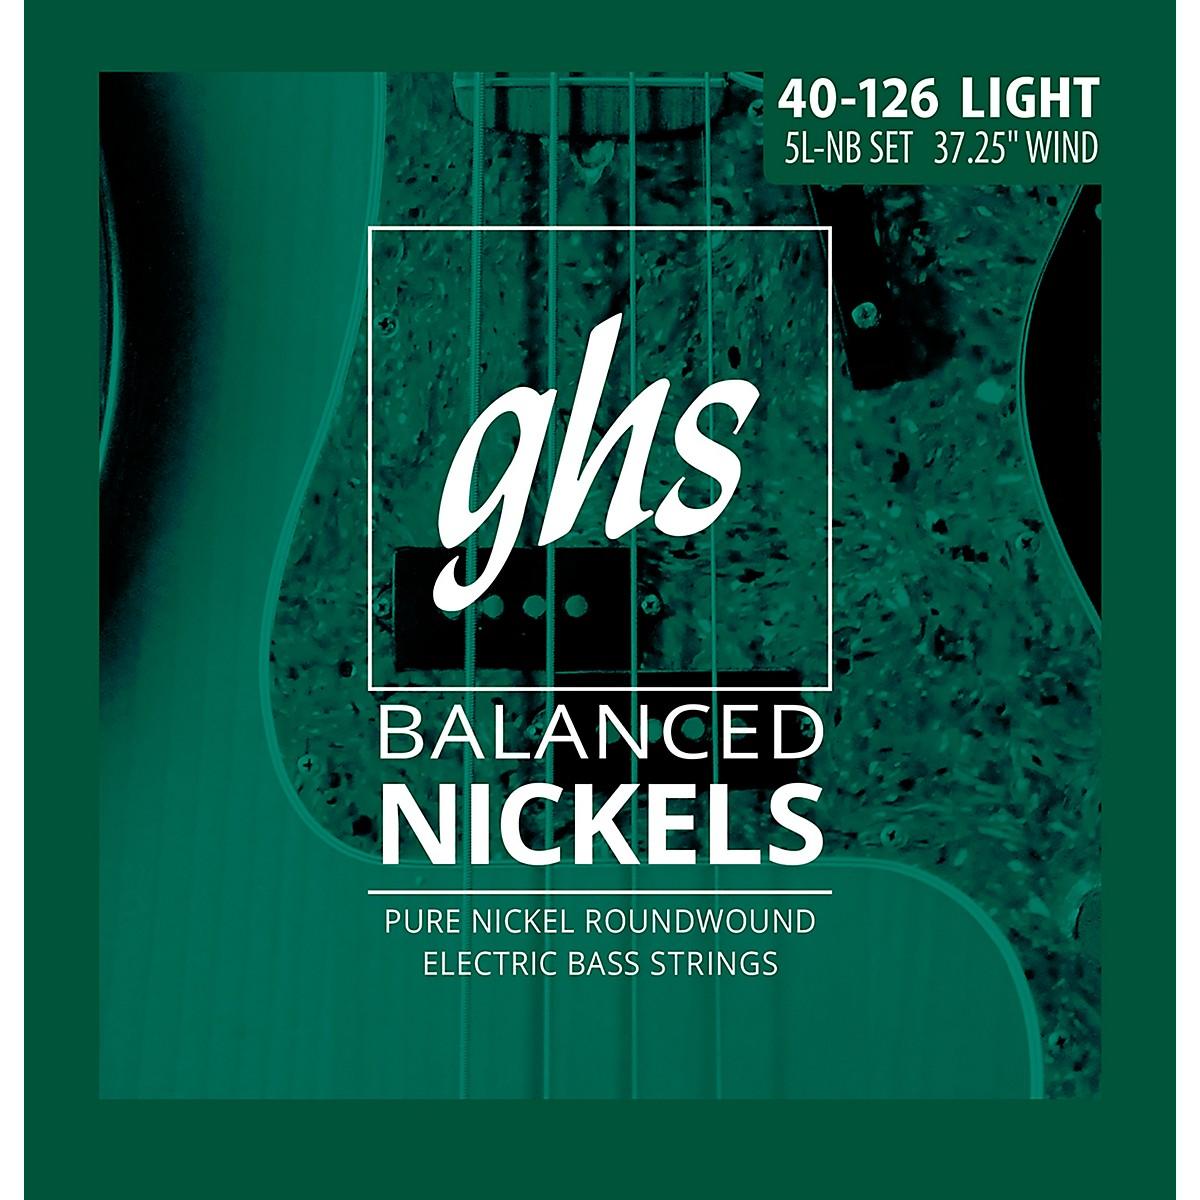 GHS Pure Nickel Roundwound Light 40-126